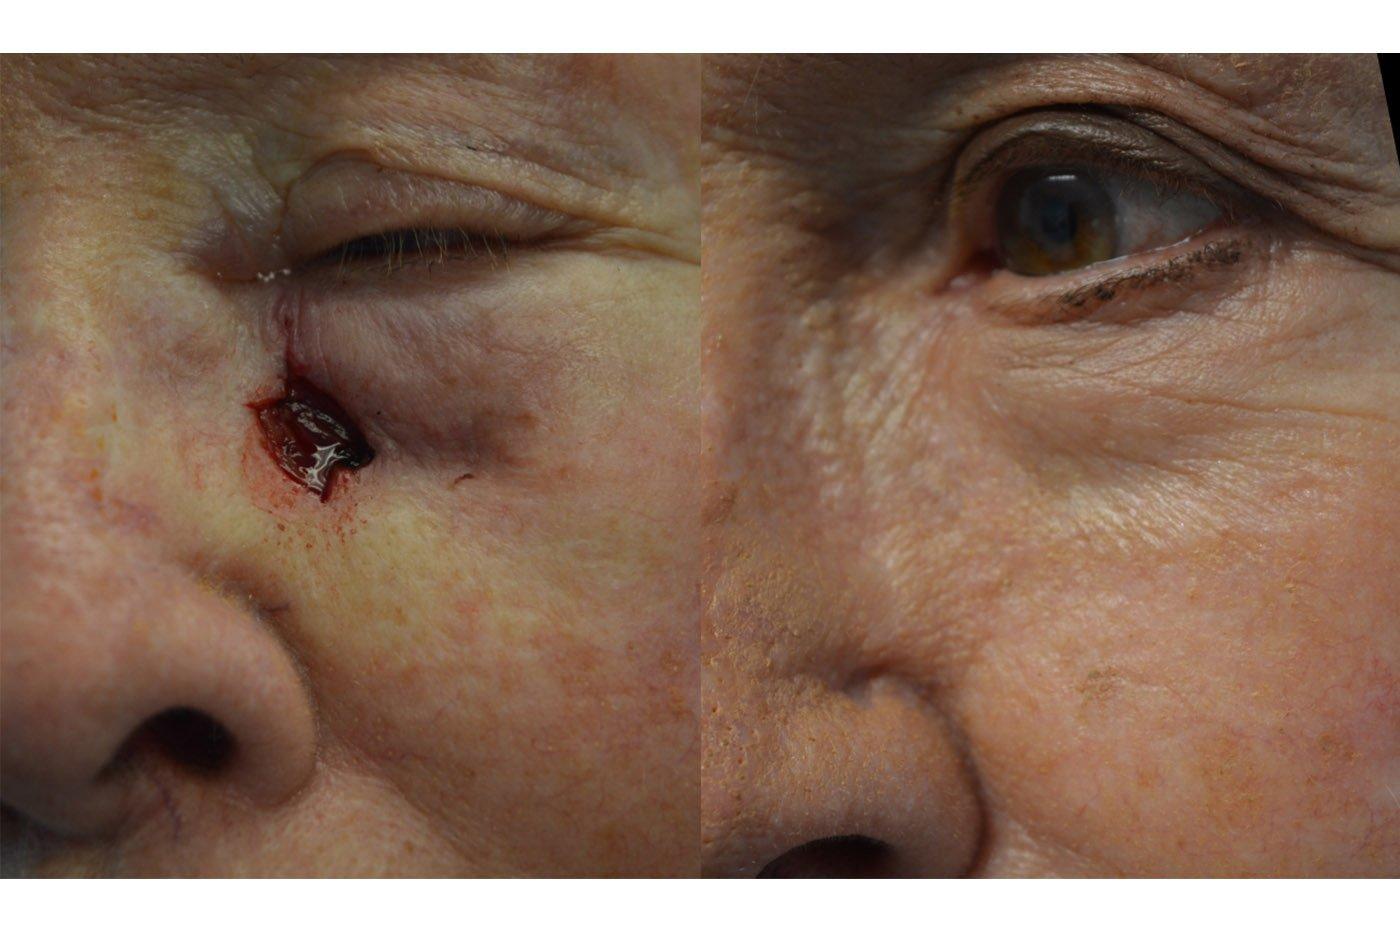 Skin cancer closure with local skin flap